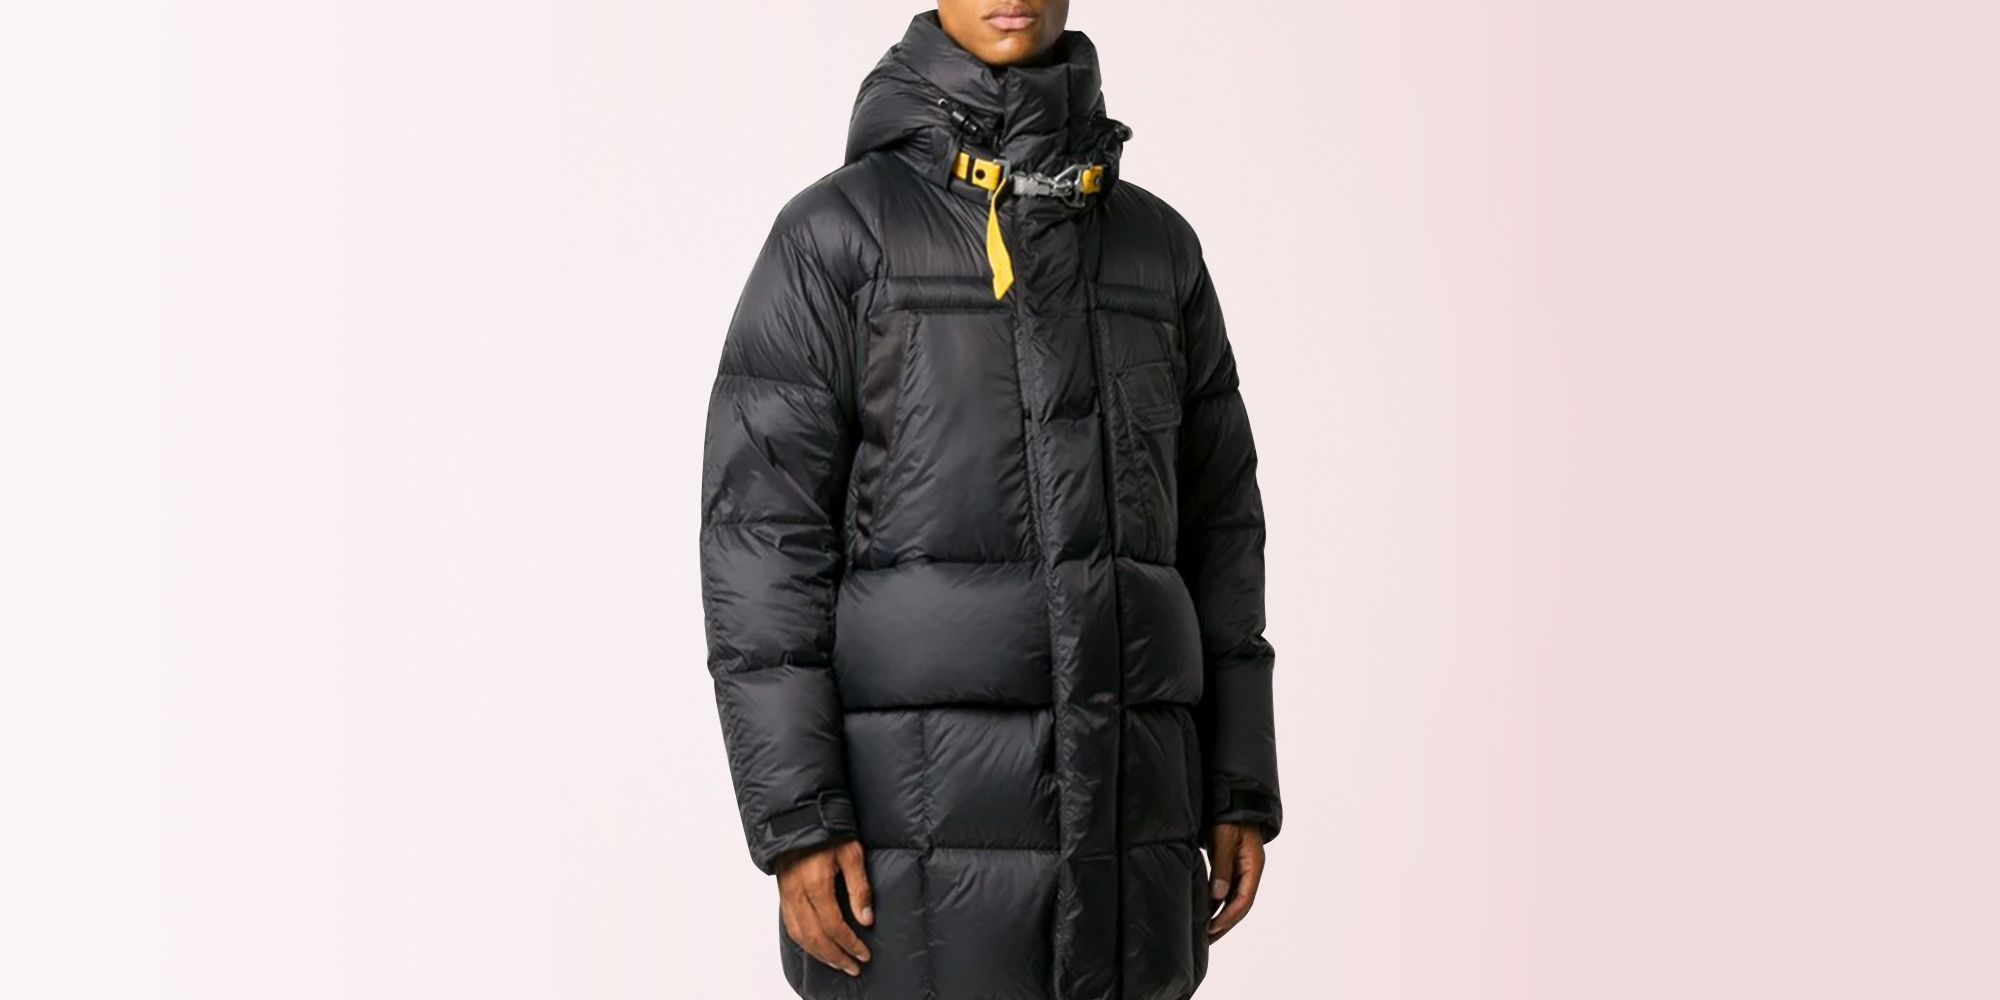 18 Best Winter Coats 2020 Warmest Men's Jackets for Cold